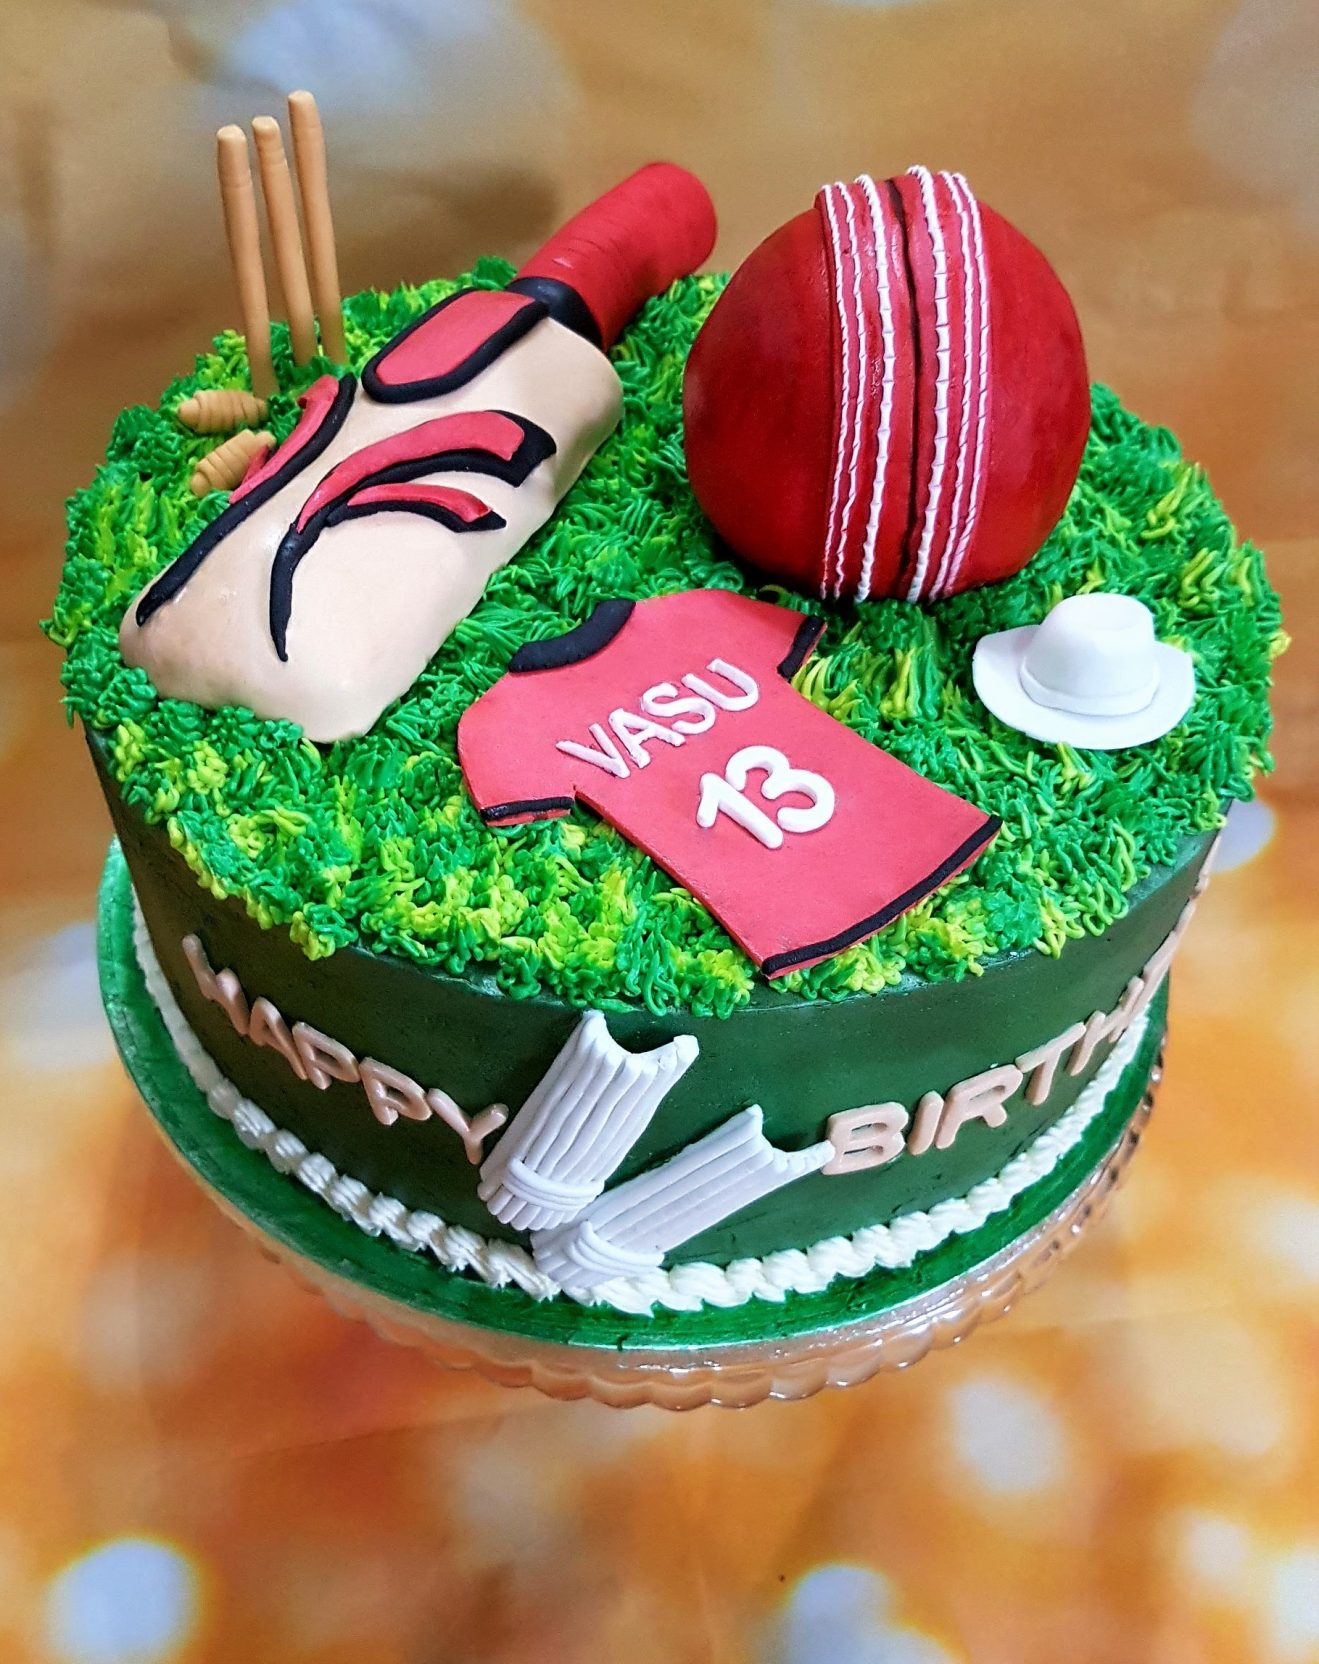 Cricket Themed Wedding Cake